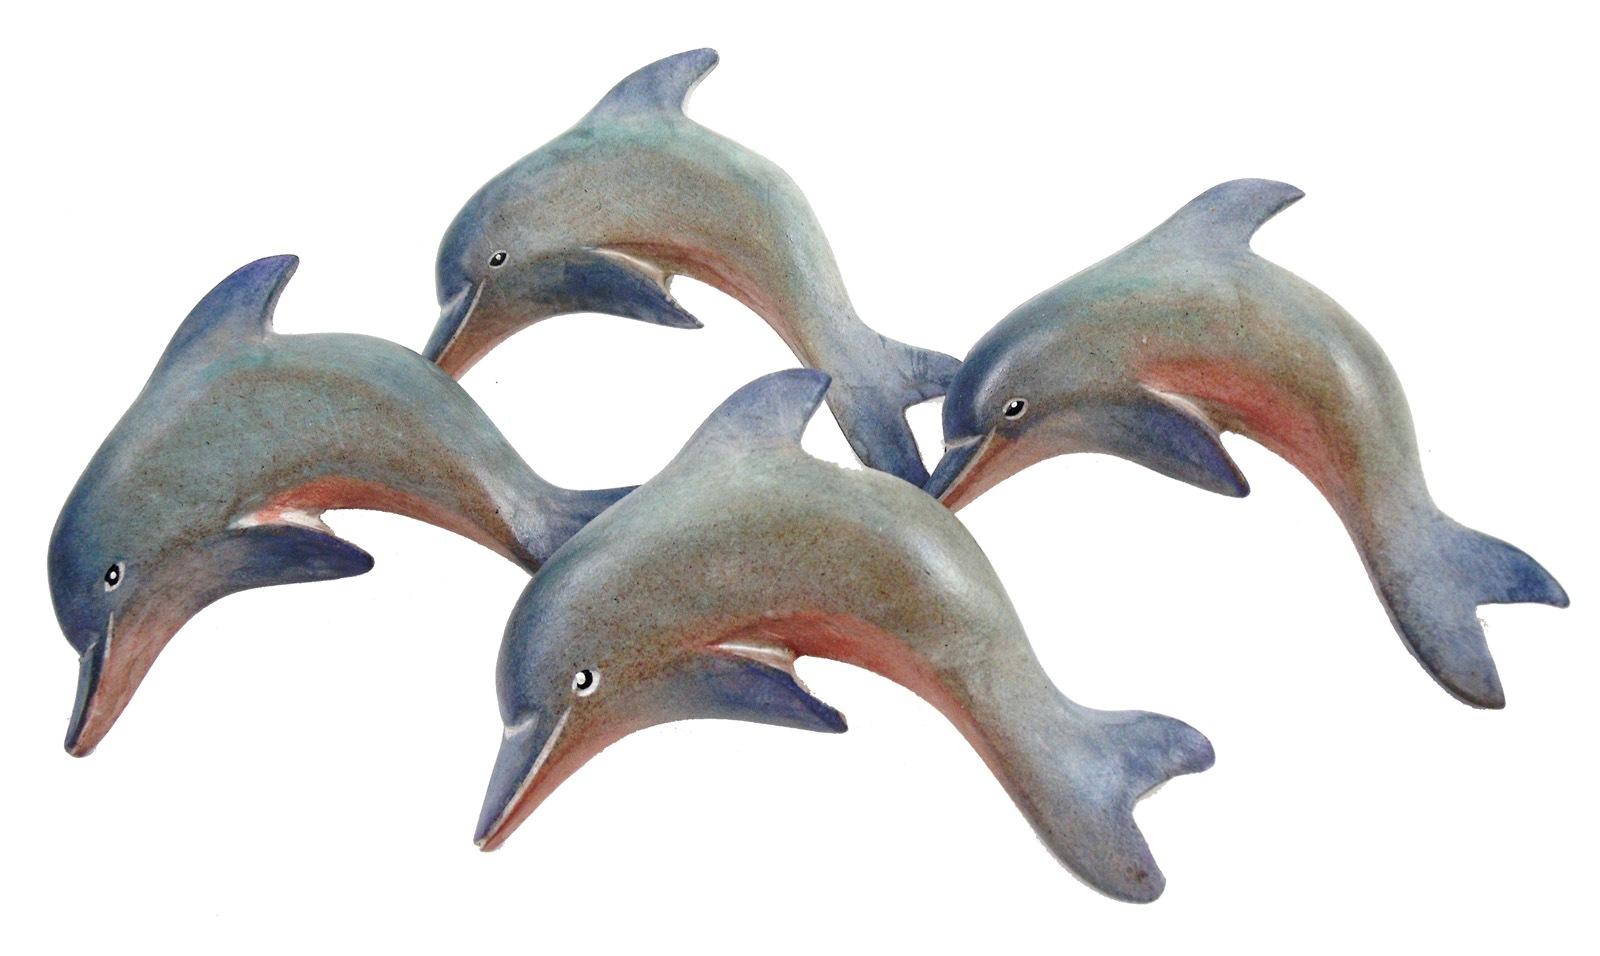 Nautical Ocean Marine Dolphin Napkin Rings Set Of 4 Carved Painted Wood Walmart Com Walmart Com